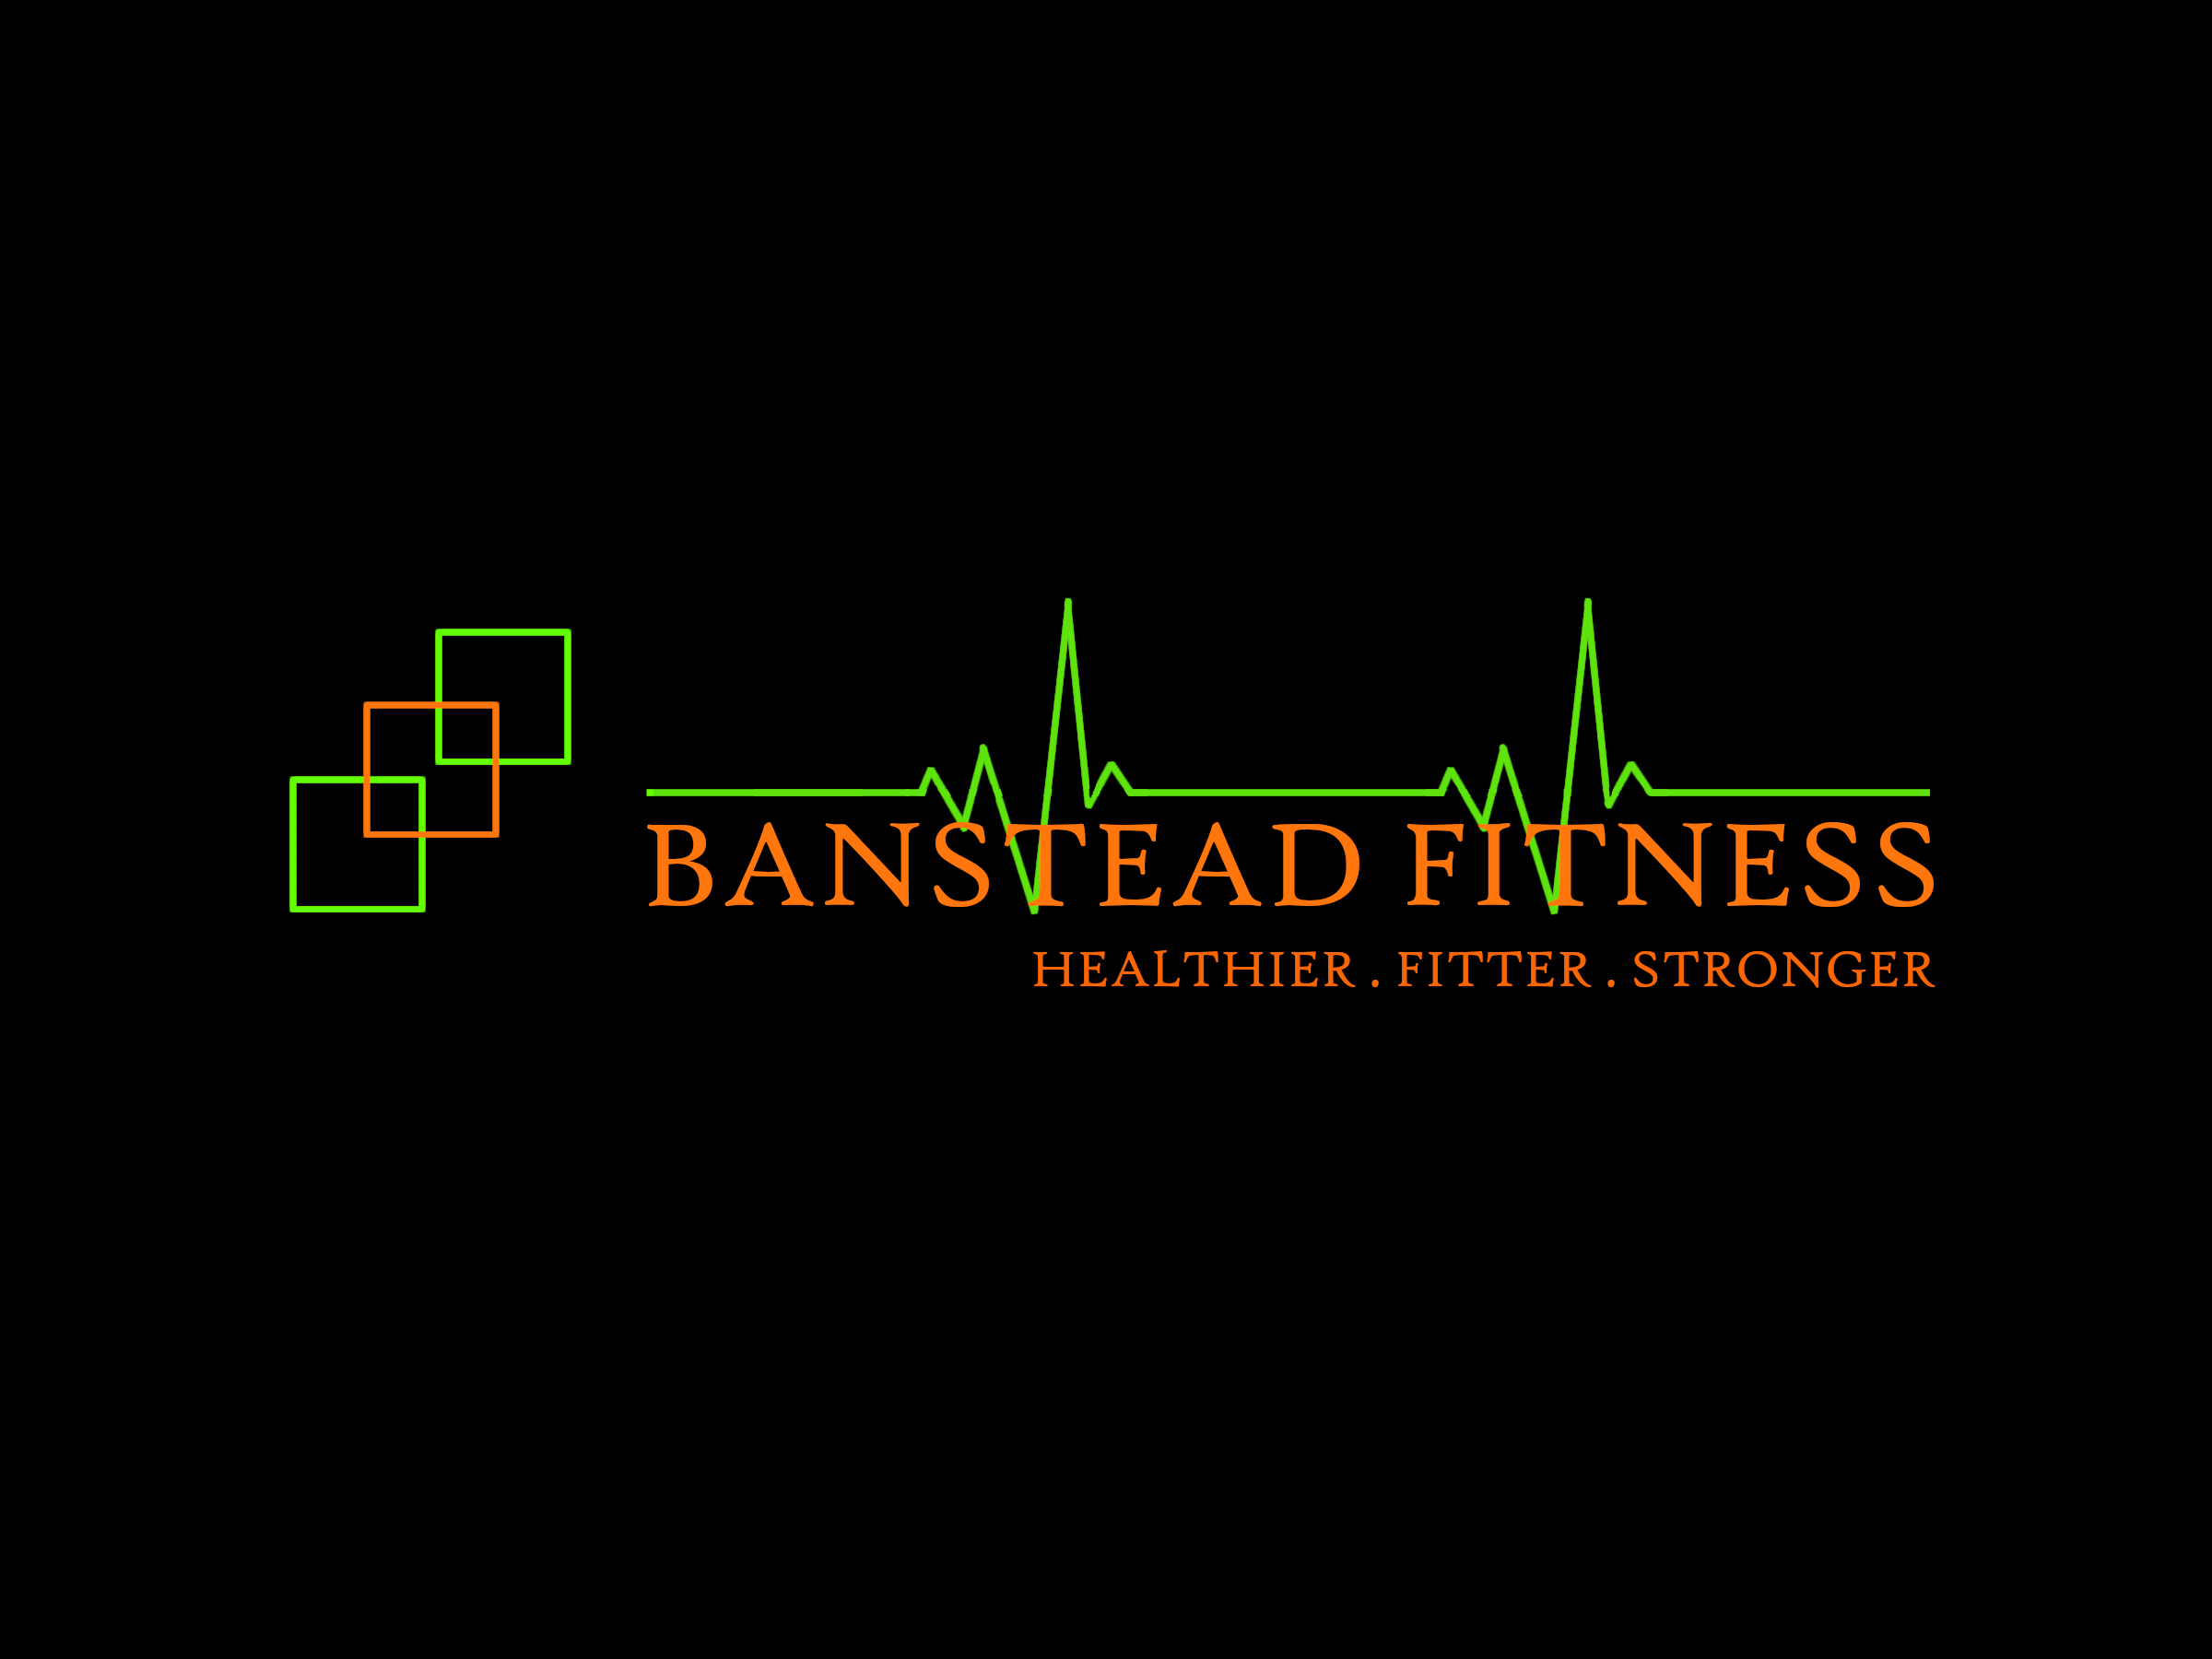 Banstead Fitness